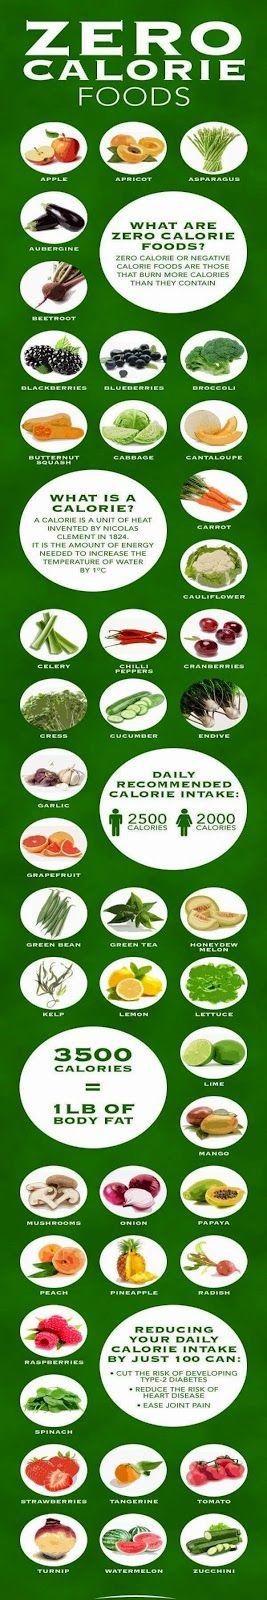 Zero Calorie Foods | Tricksly